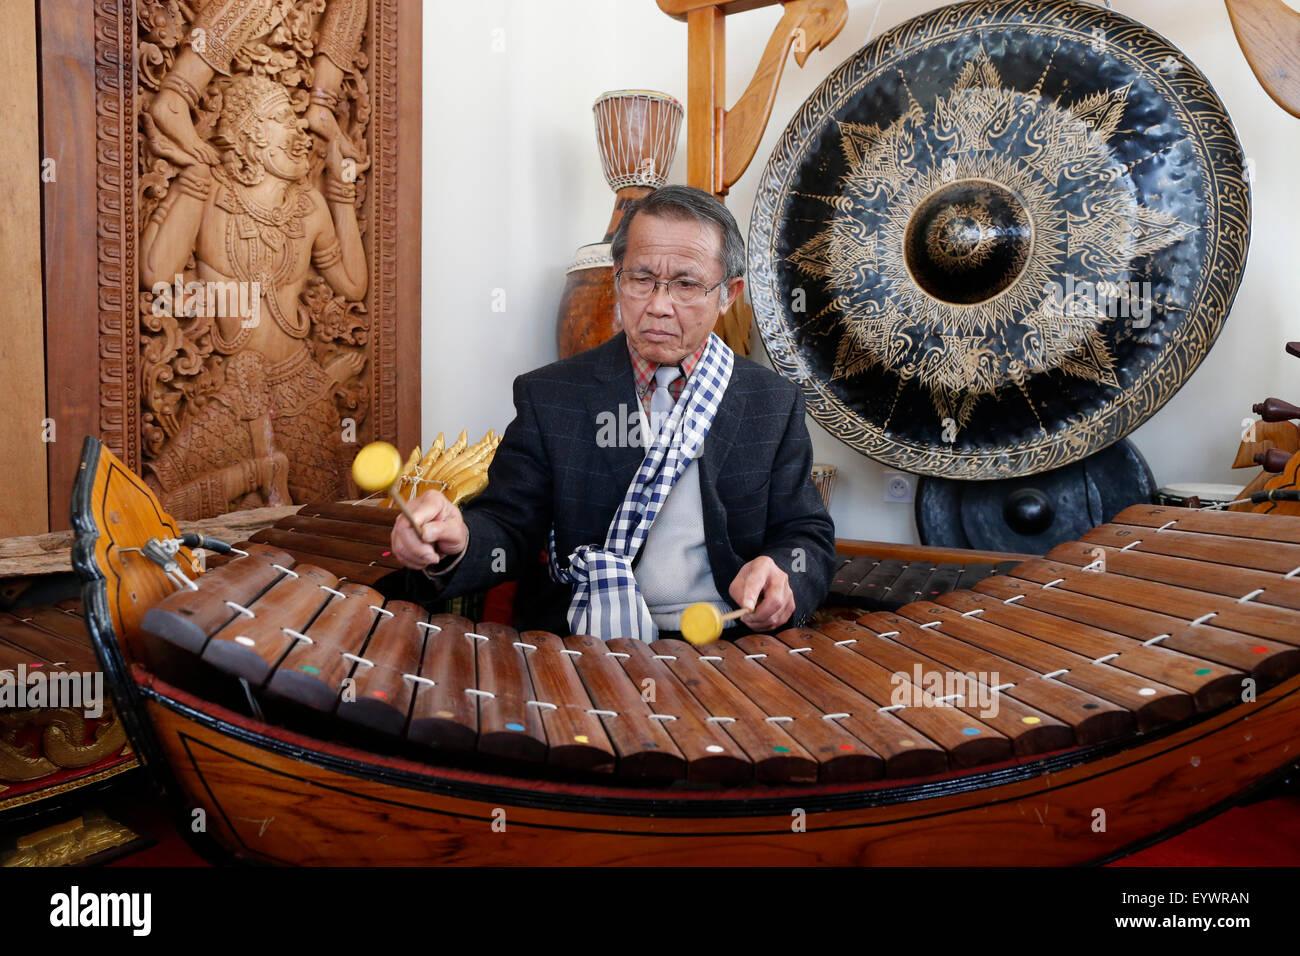 Laotian traditional music, xylophone Lanat, Wat Velouvanaram, Bussy St. George, Seine et Marne, France, Europe - Stock Image